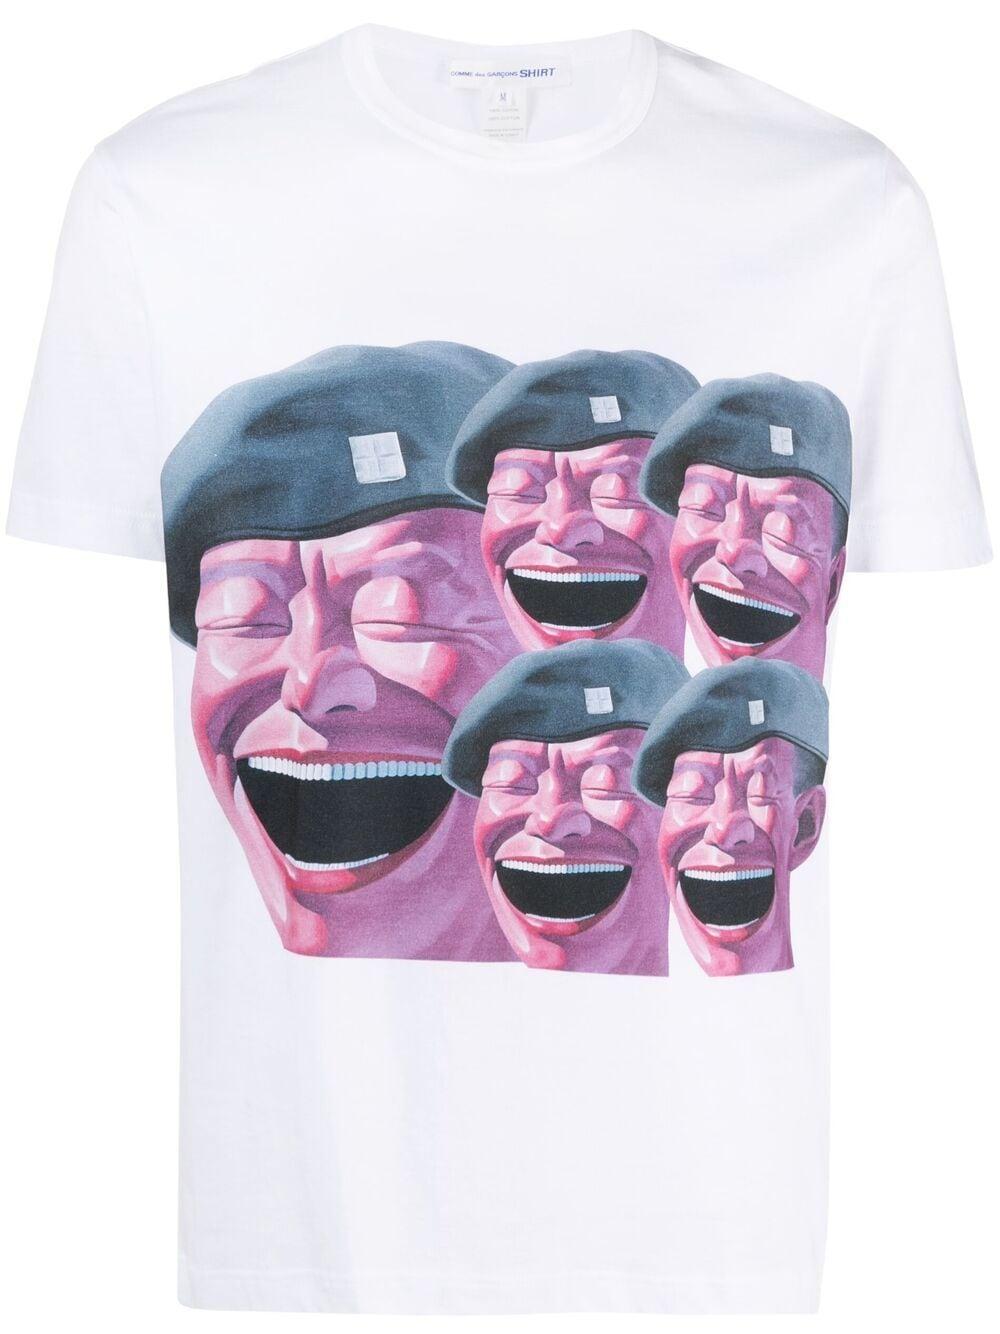 Comme Des Garçons Shirt t-shirt uomo bianco COMME DES GARÇONS SHIRT   T-shirt   FG-T003WHITE/PRINTF